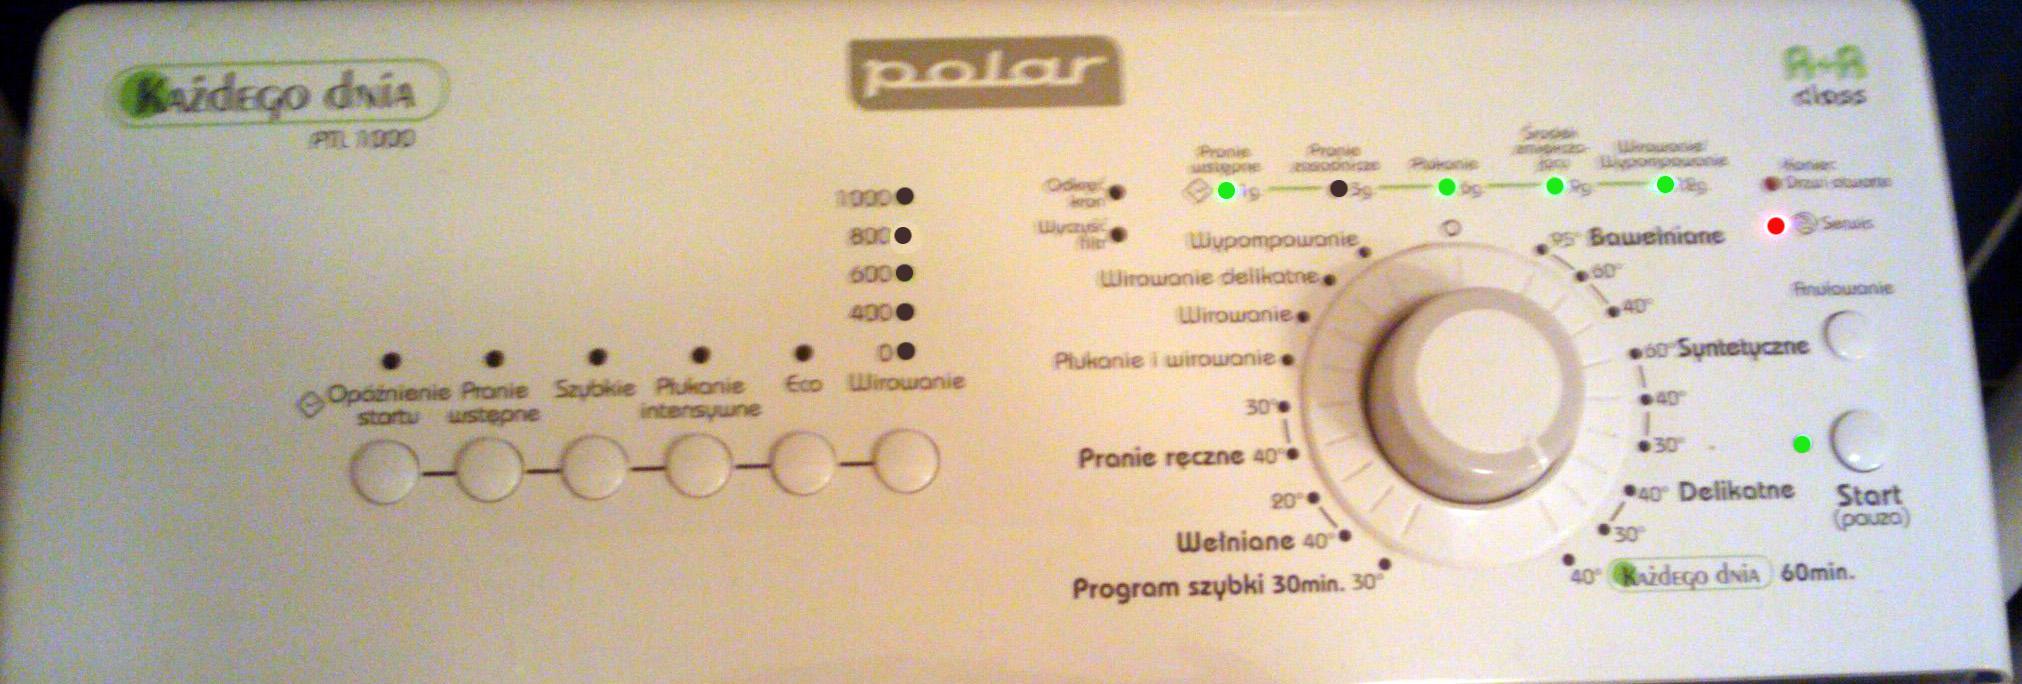 Polar PTL 1000 jaki to kod b��du ?